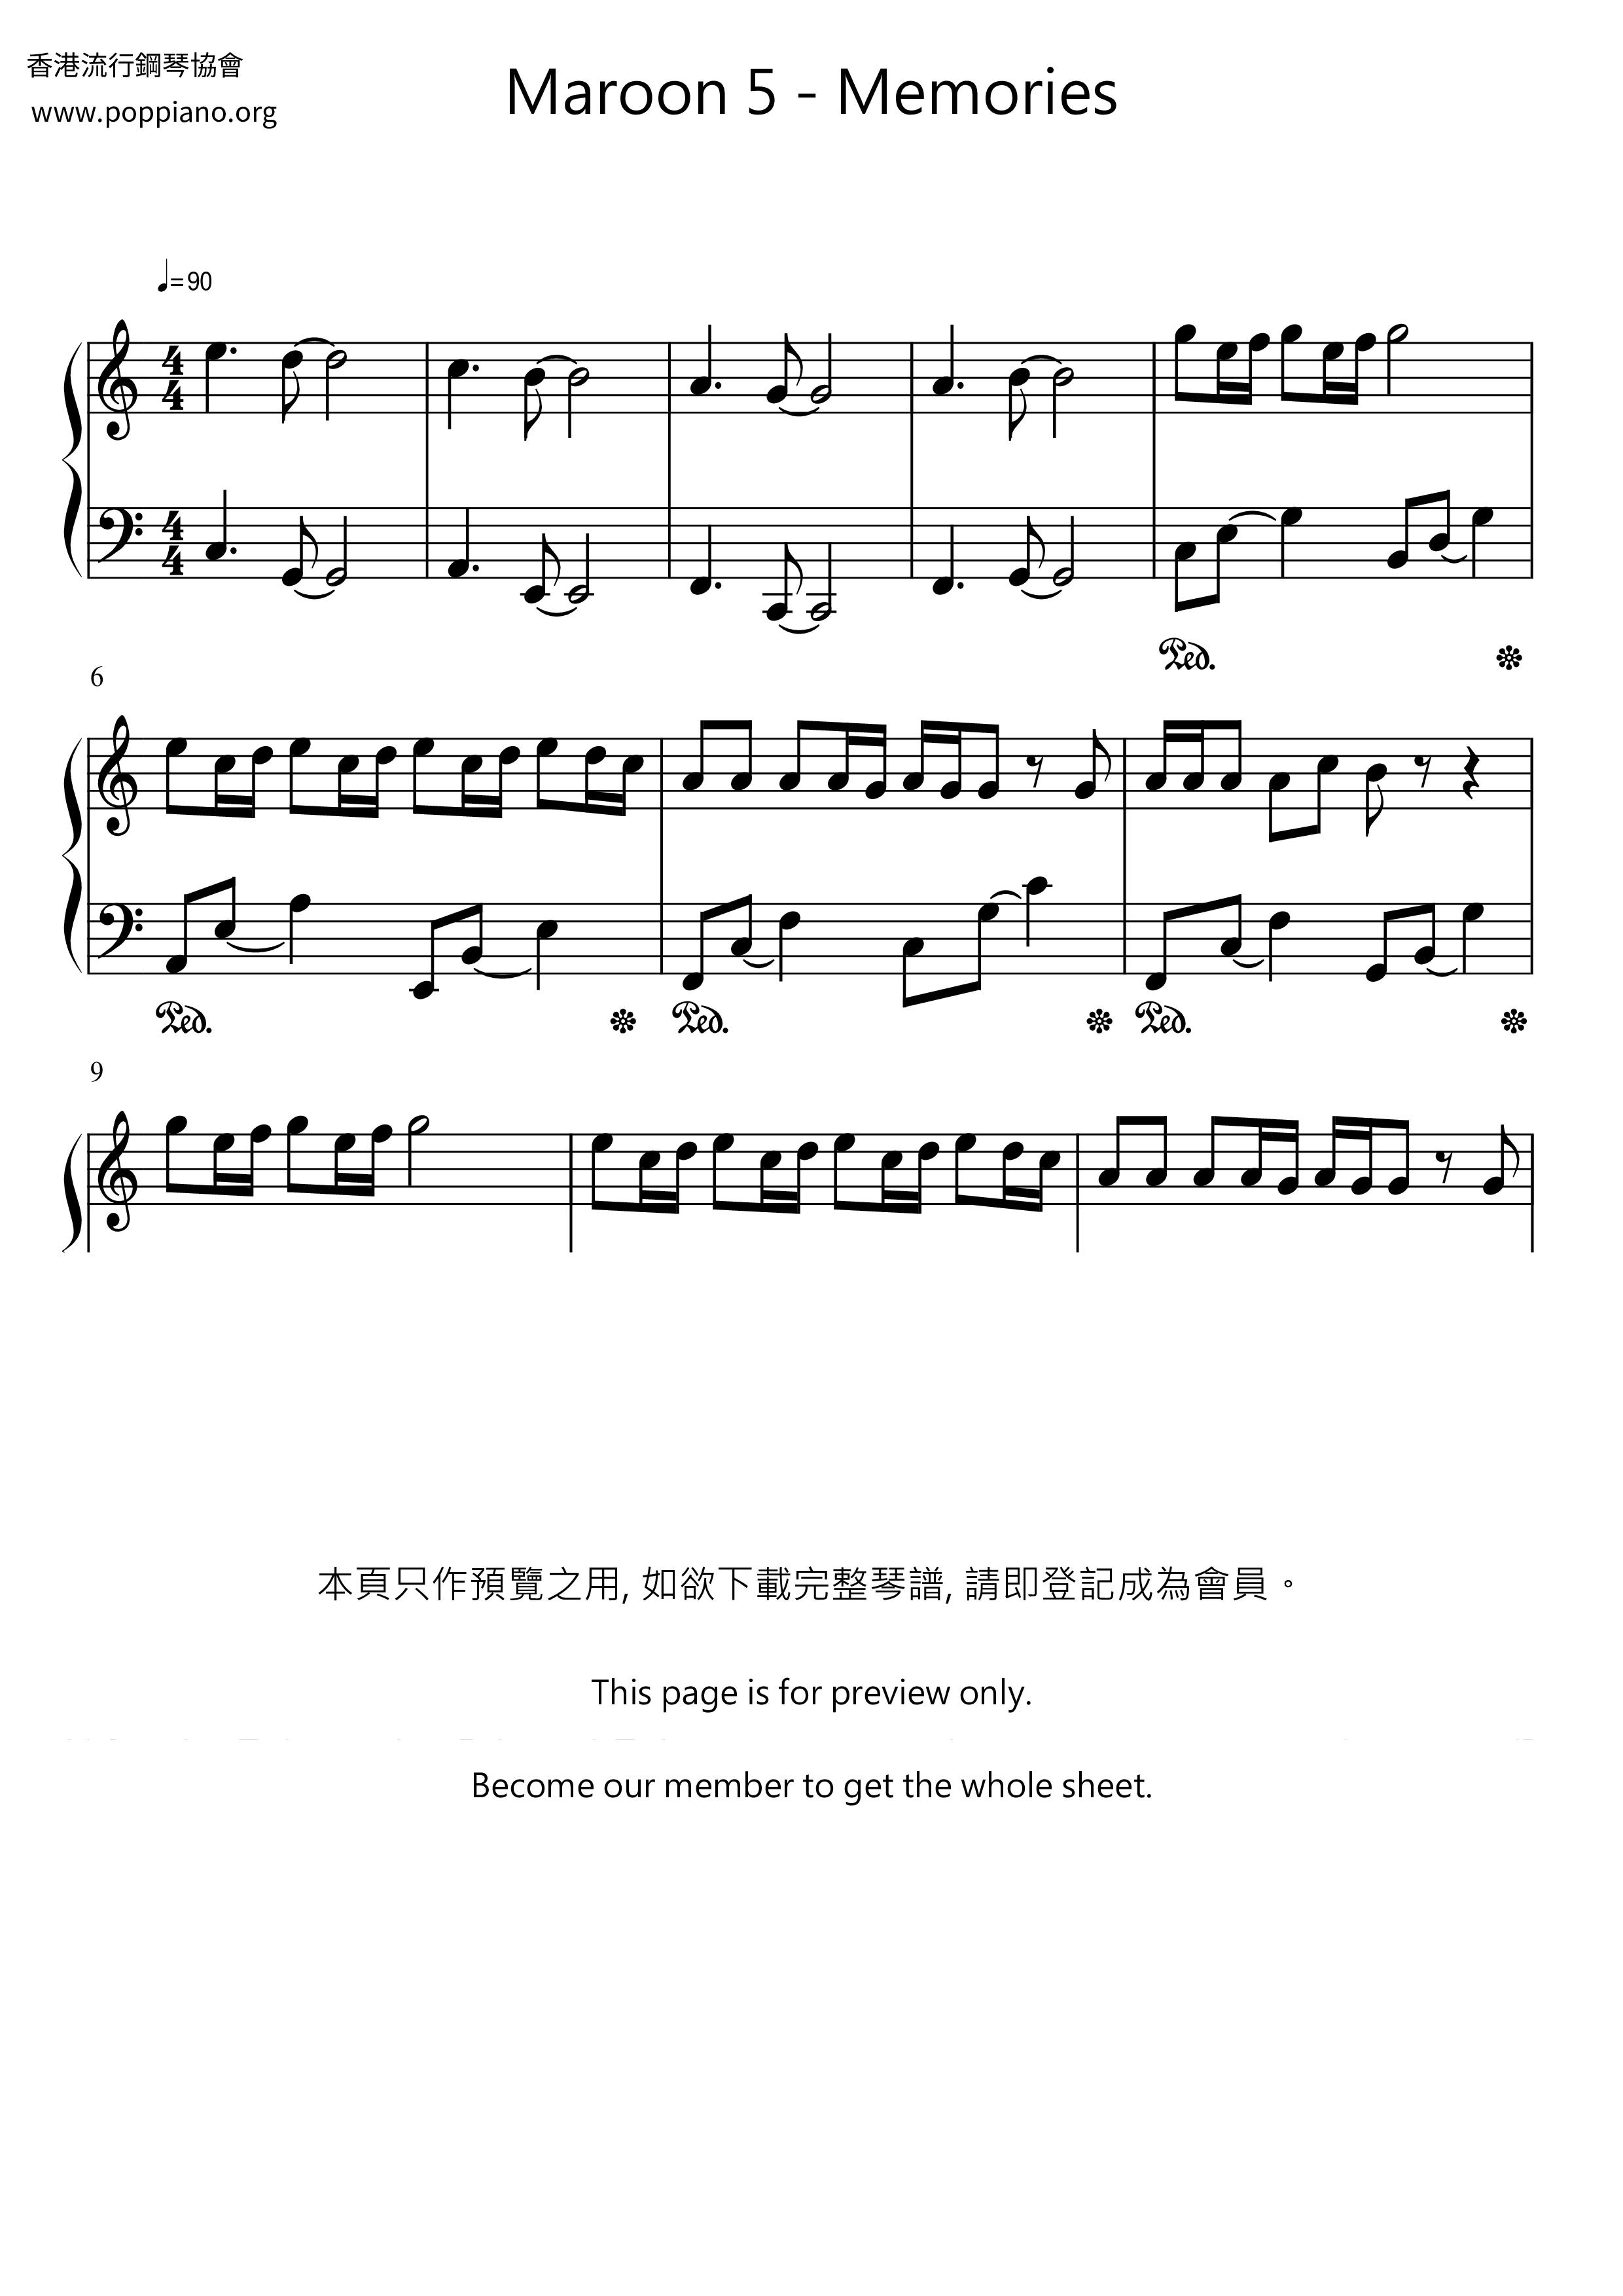 Memories Sheet Music Piano Score Free Pdf Download Hk Pop Piano Academy